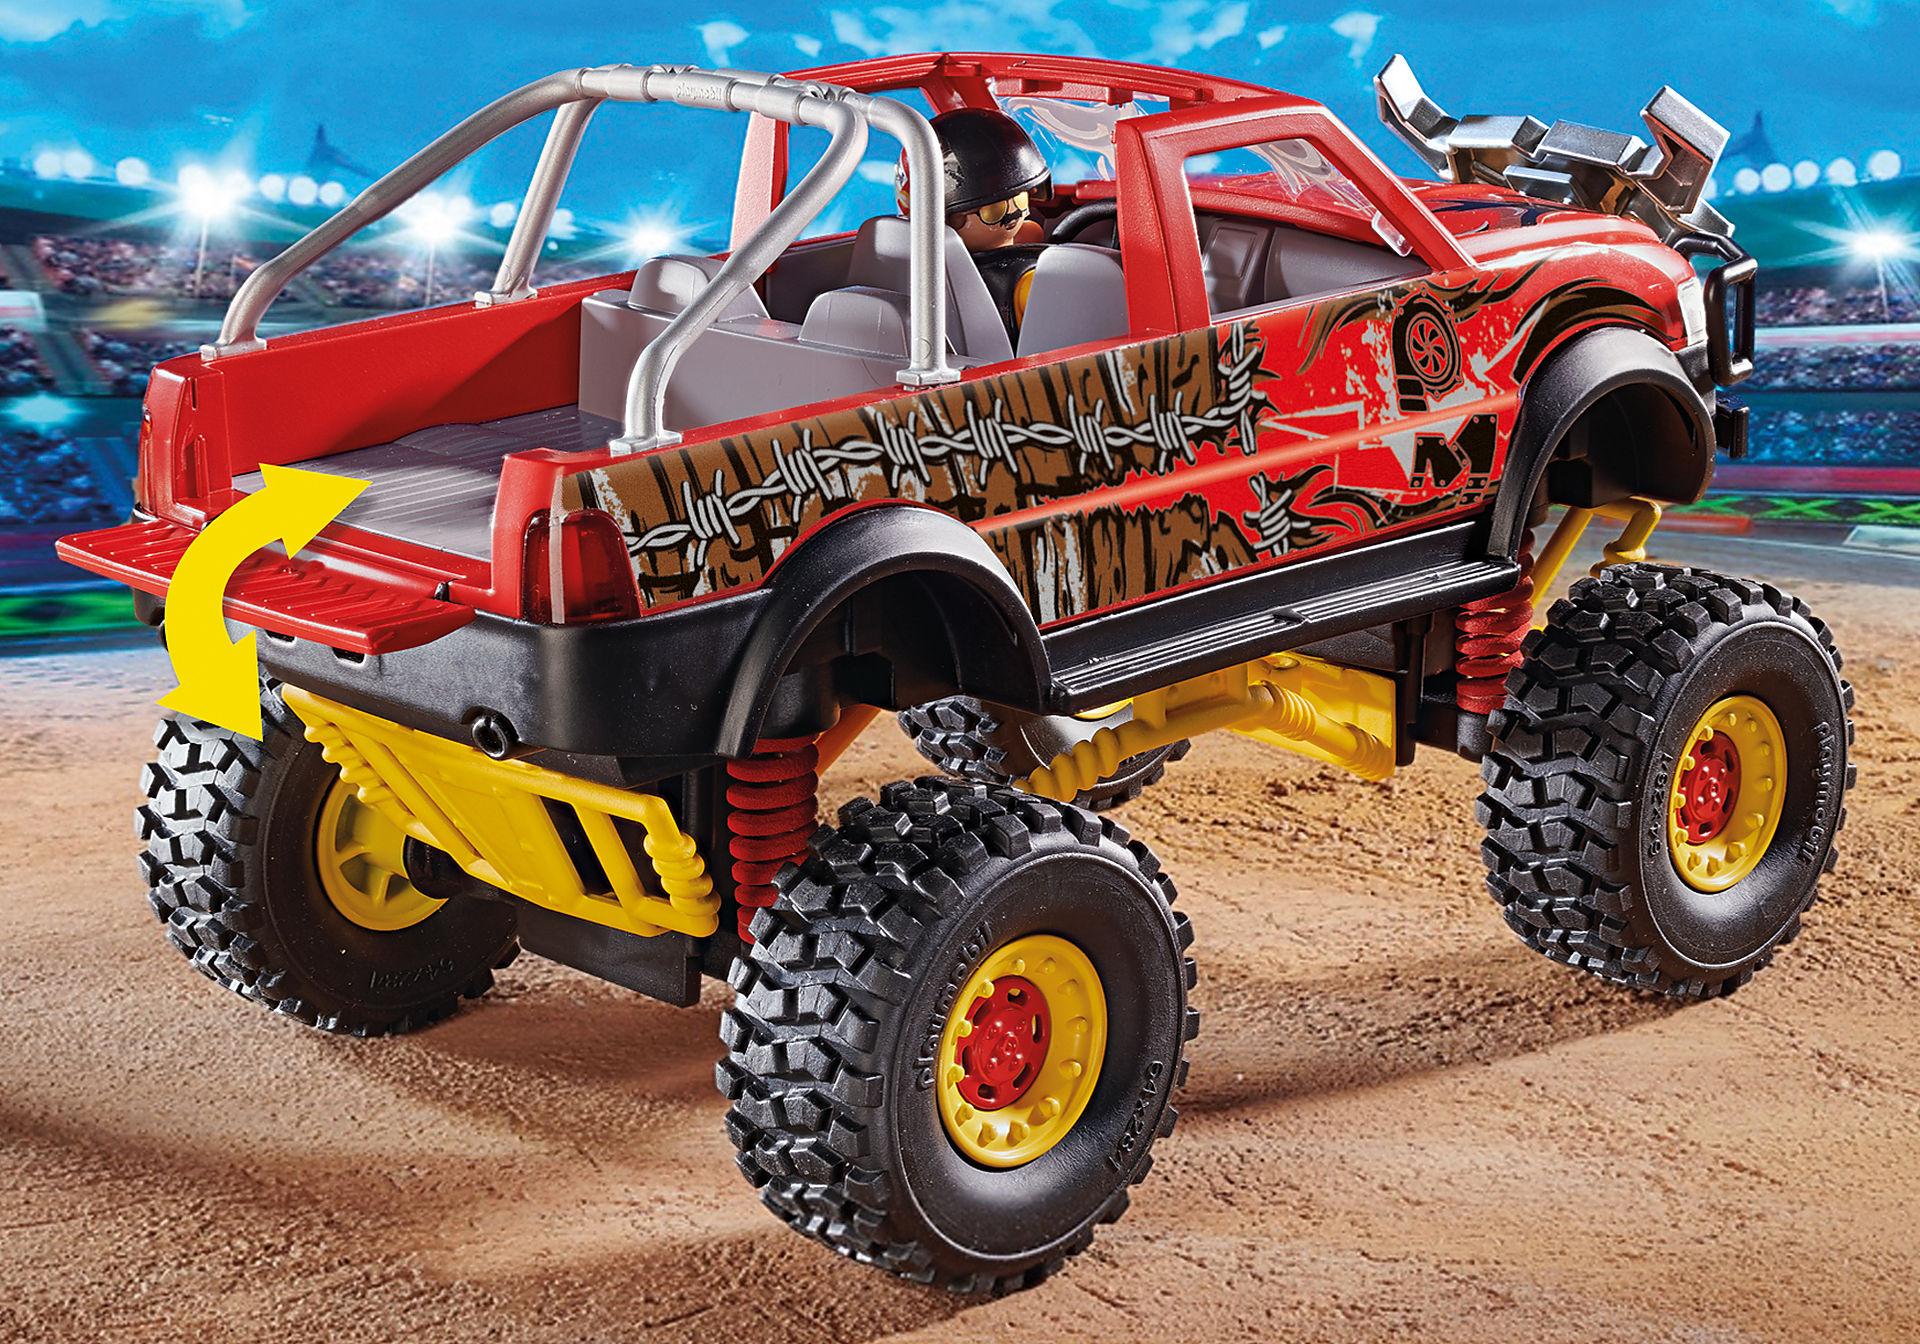 70549 Monster Truck Bika zoom image5